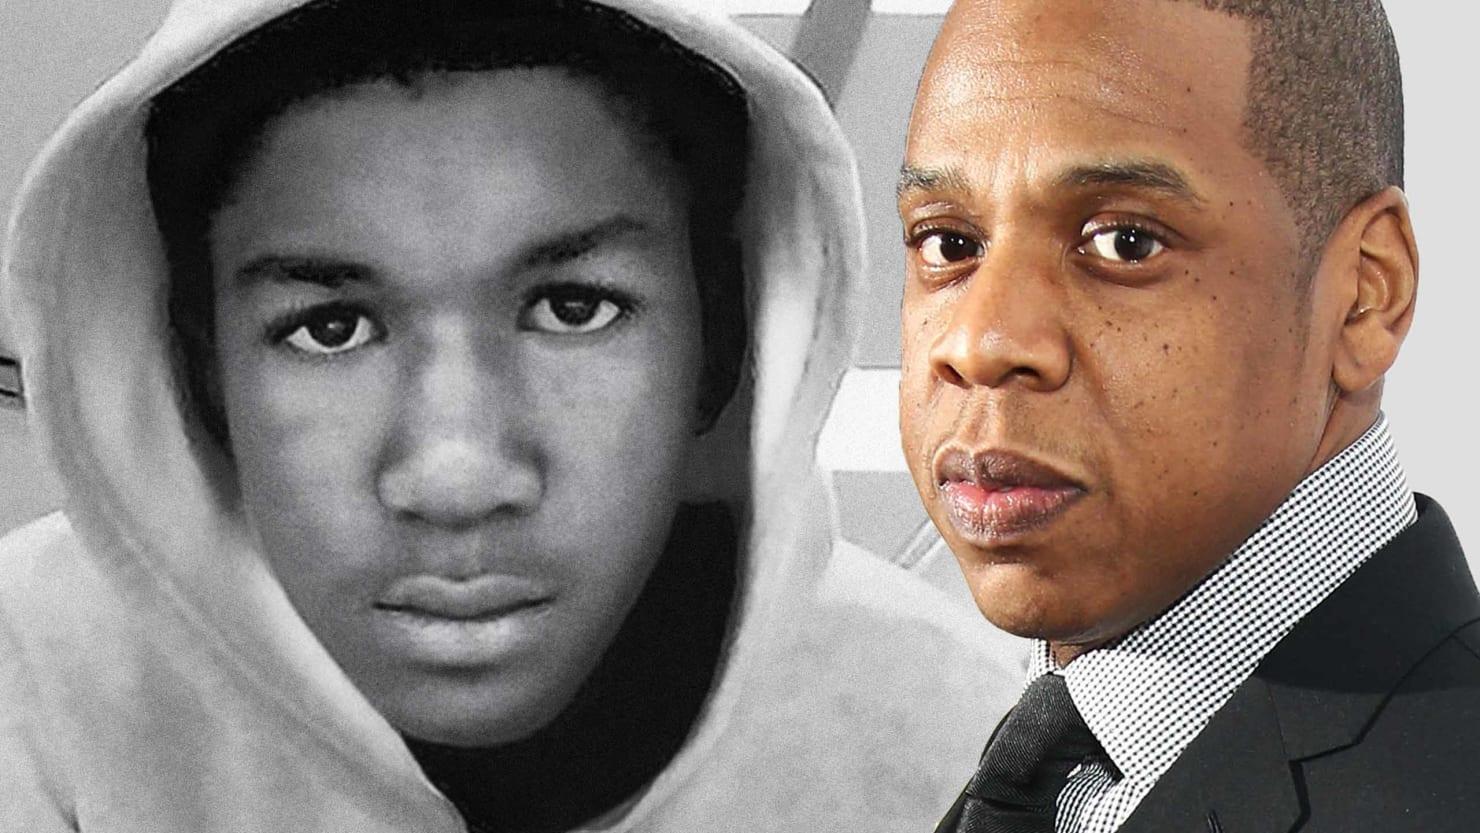 Jay-Z's Powerful Trayvon Martin Documentary Takes Aim at the Myth of 'Post-Racial' America